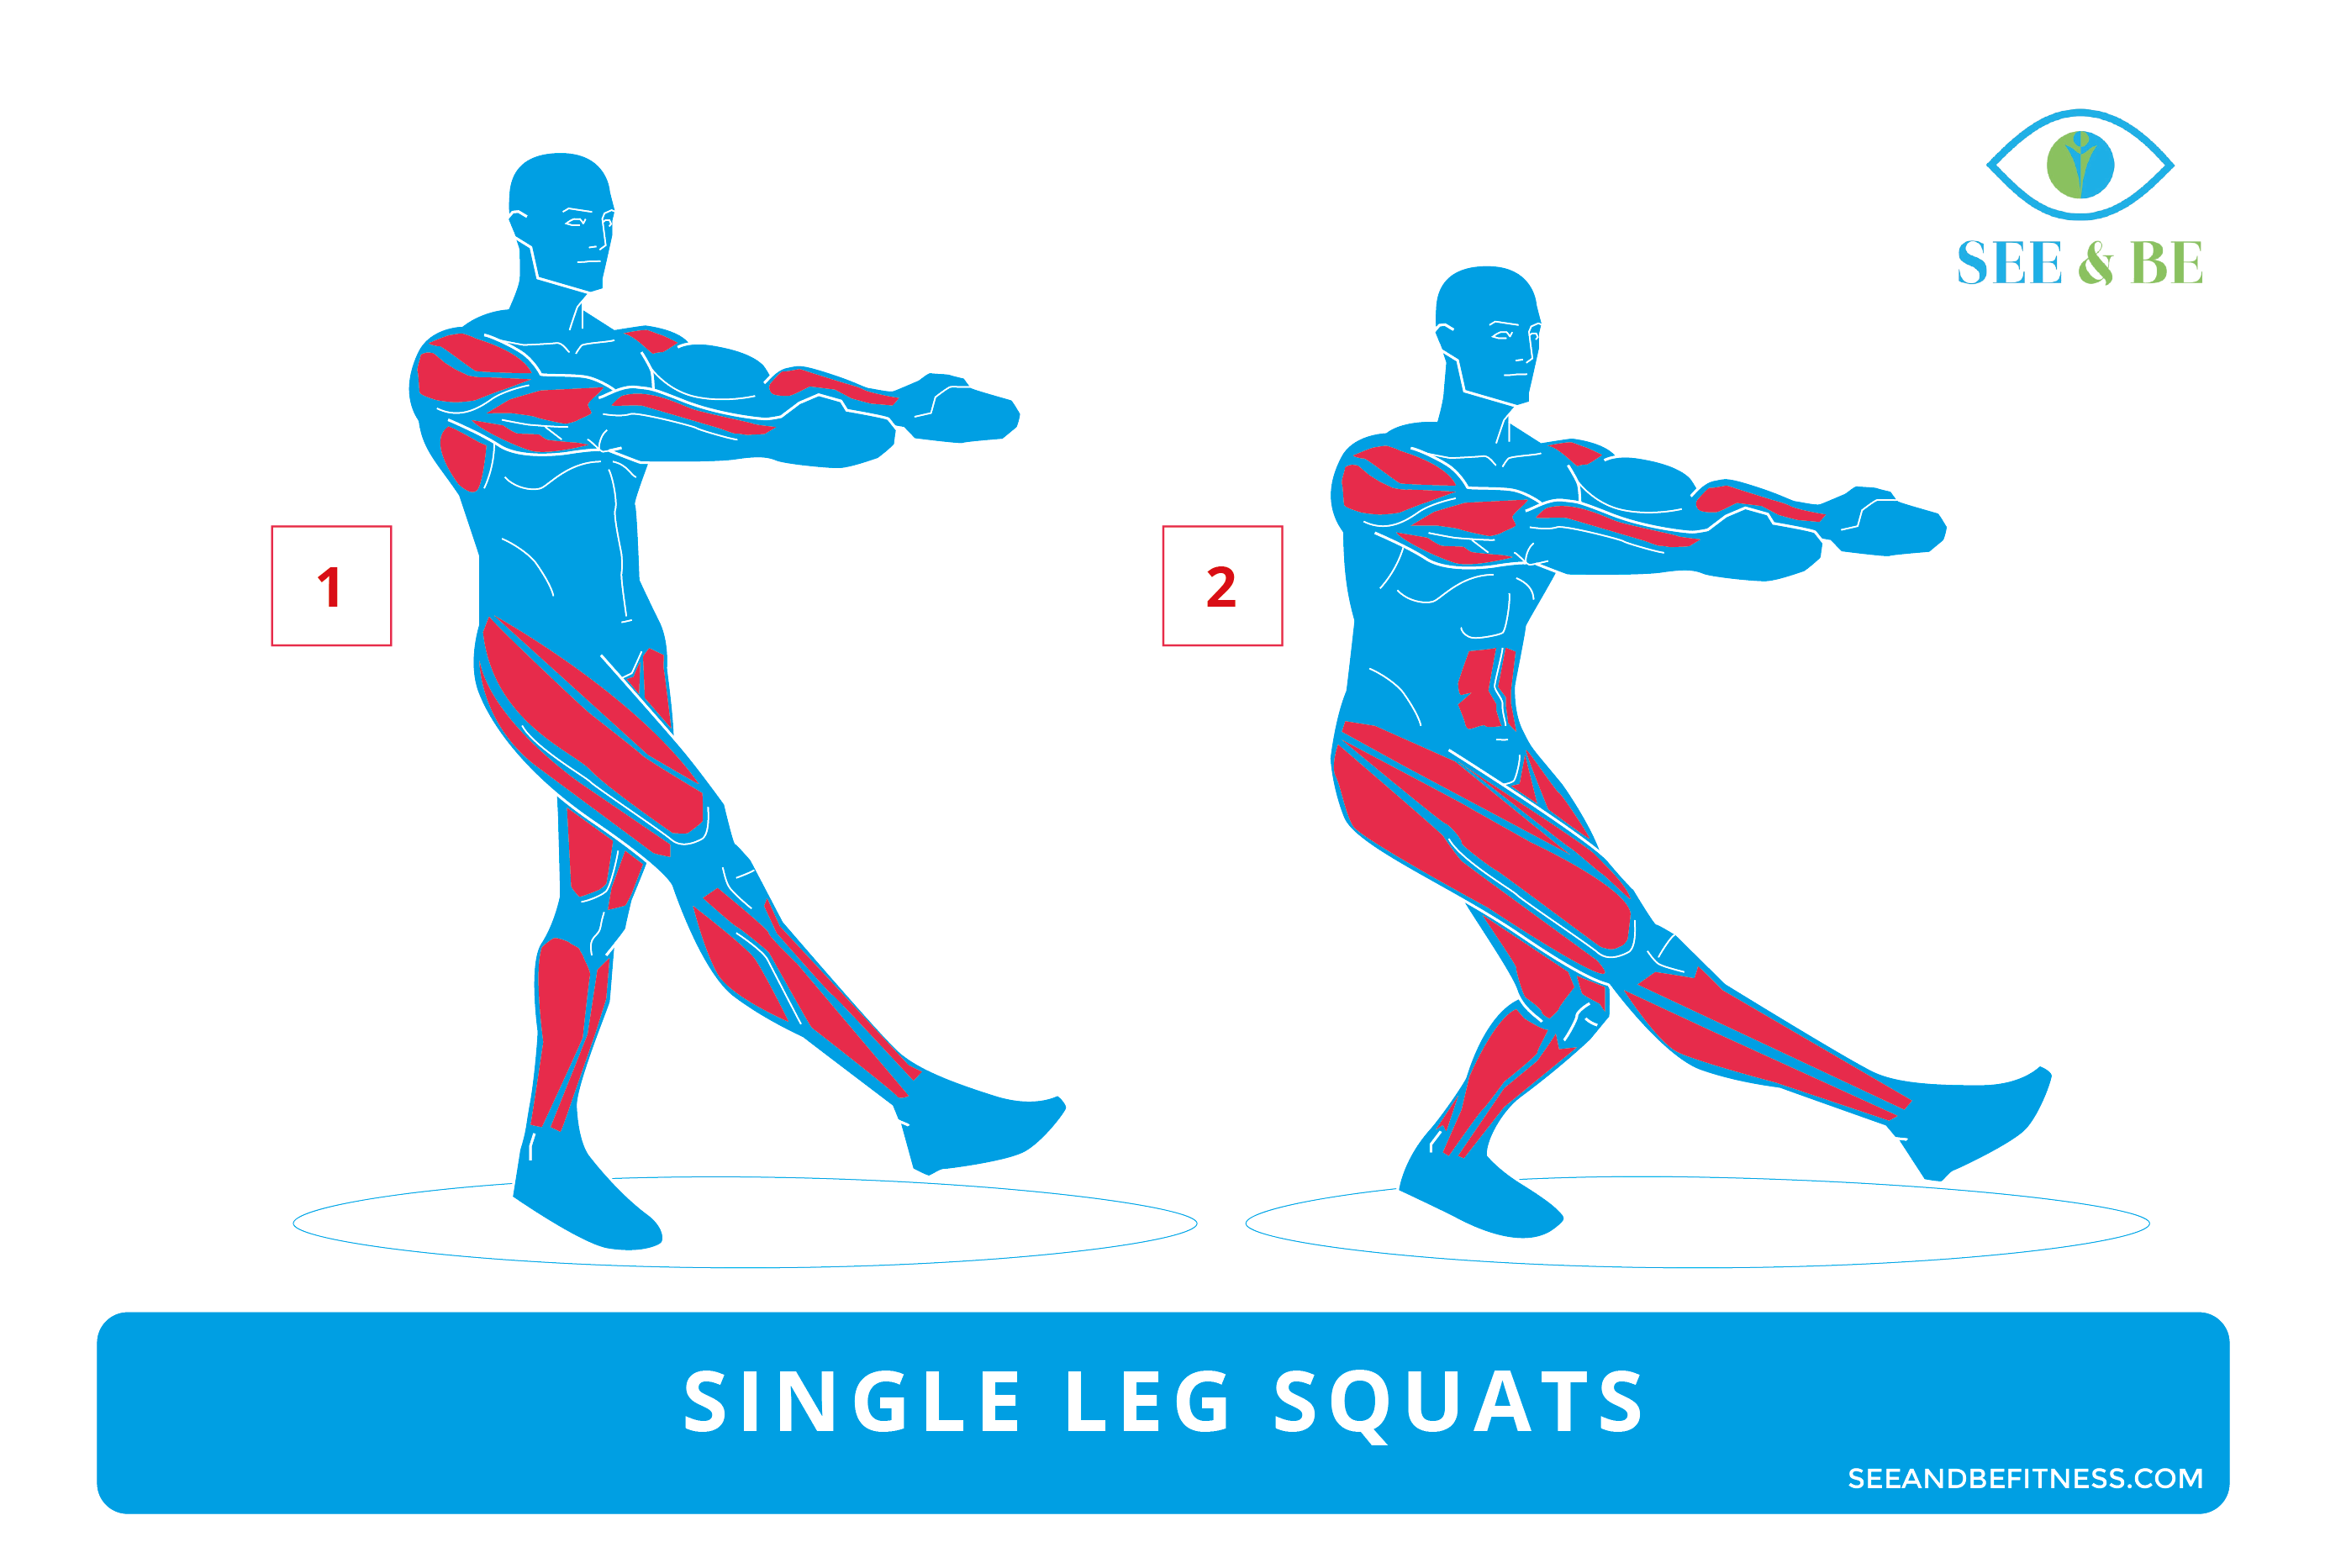 Single leg squats see. Fitness clipart plank